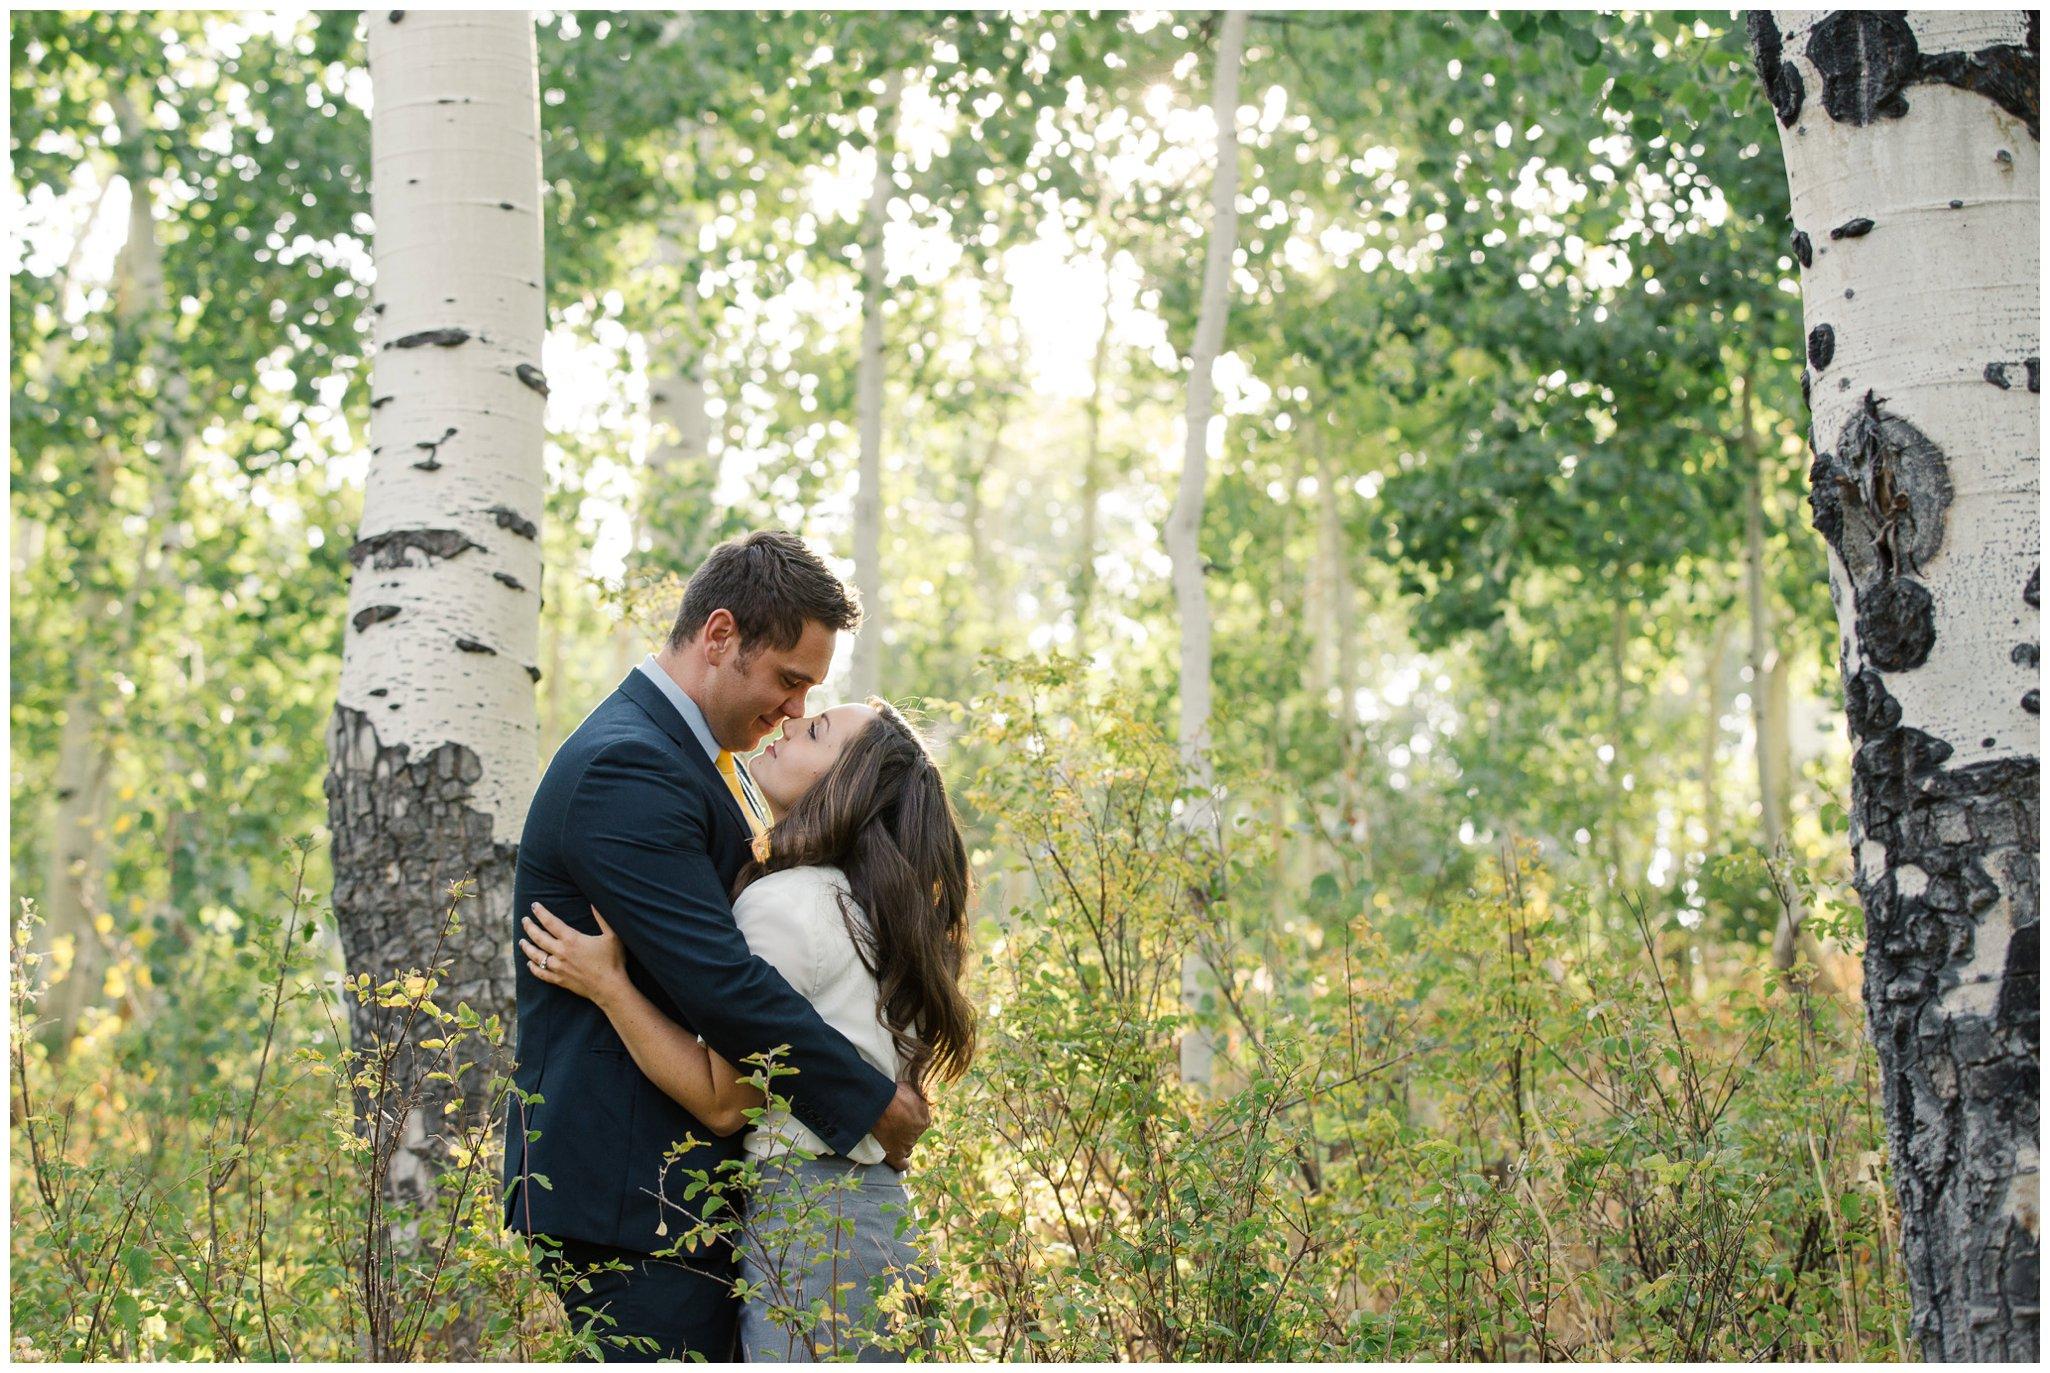 Jamie Tervort Photography | Colton and Avonlea | Utah Engagement Session | Payson Canyon, UT | Utah Wedding Photography